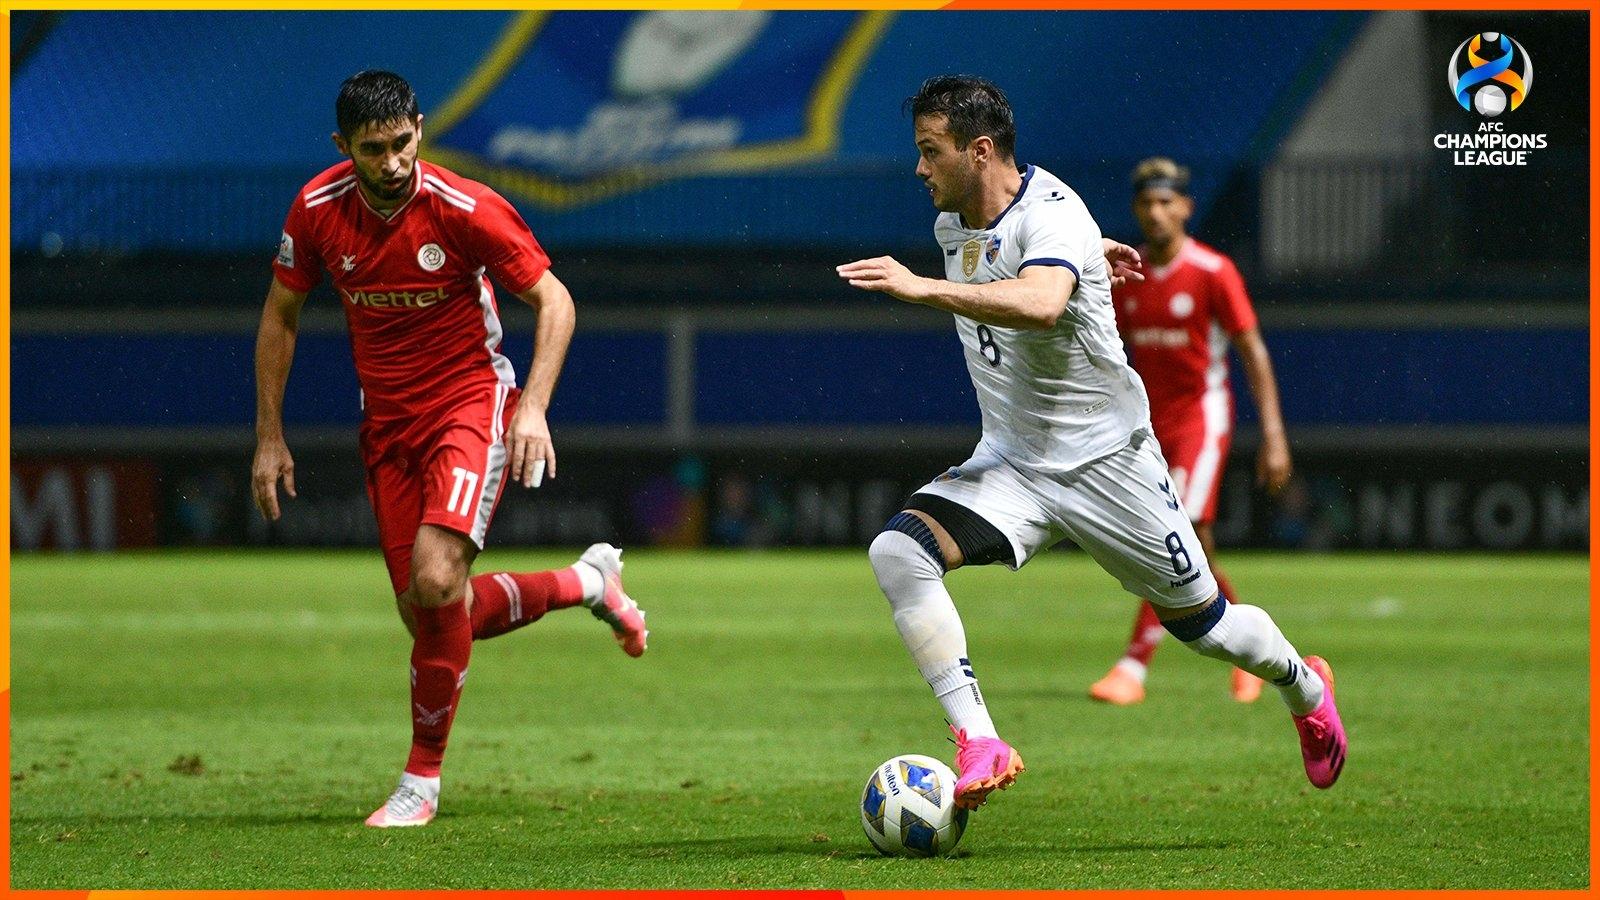 Viettel FC 0-3 Ulsan Hyundai: Bước ngoặt sau giờ nghỉ